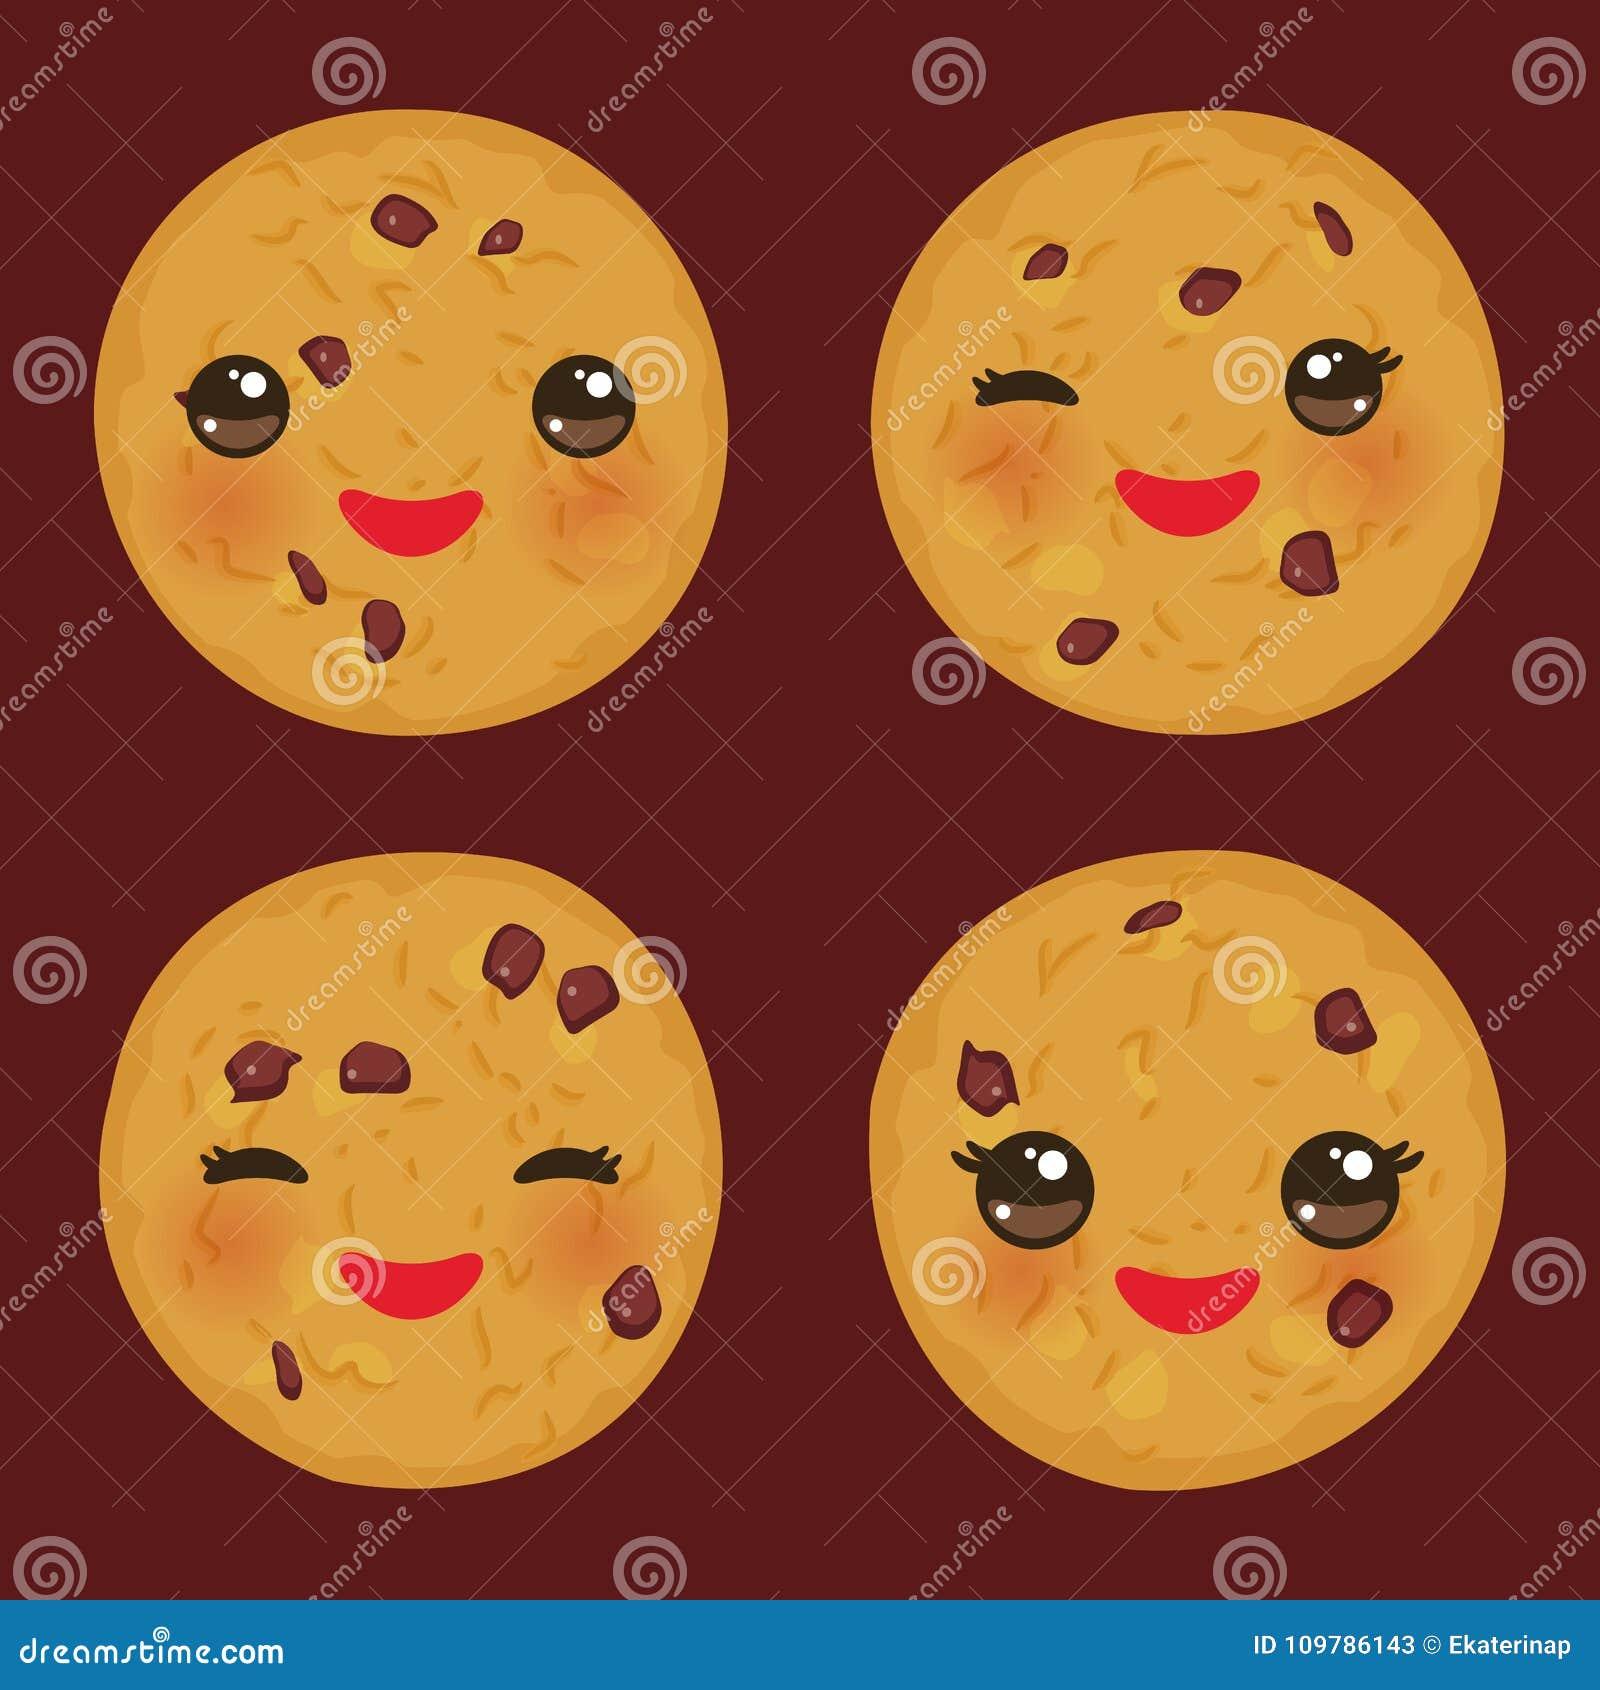 Kawaii Chocolate Chip Cookie Set Freshly Baked Isolated On